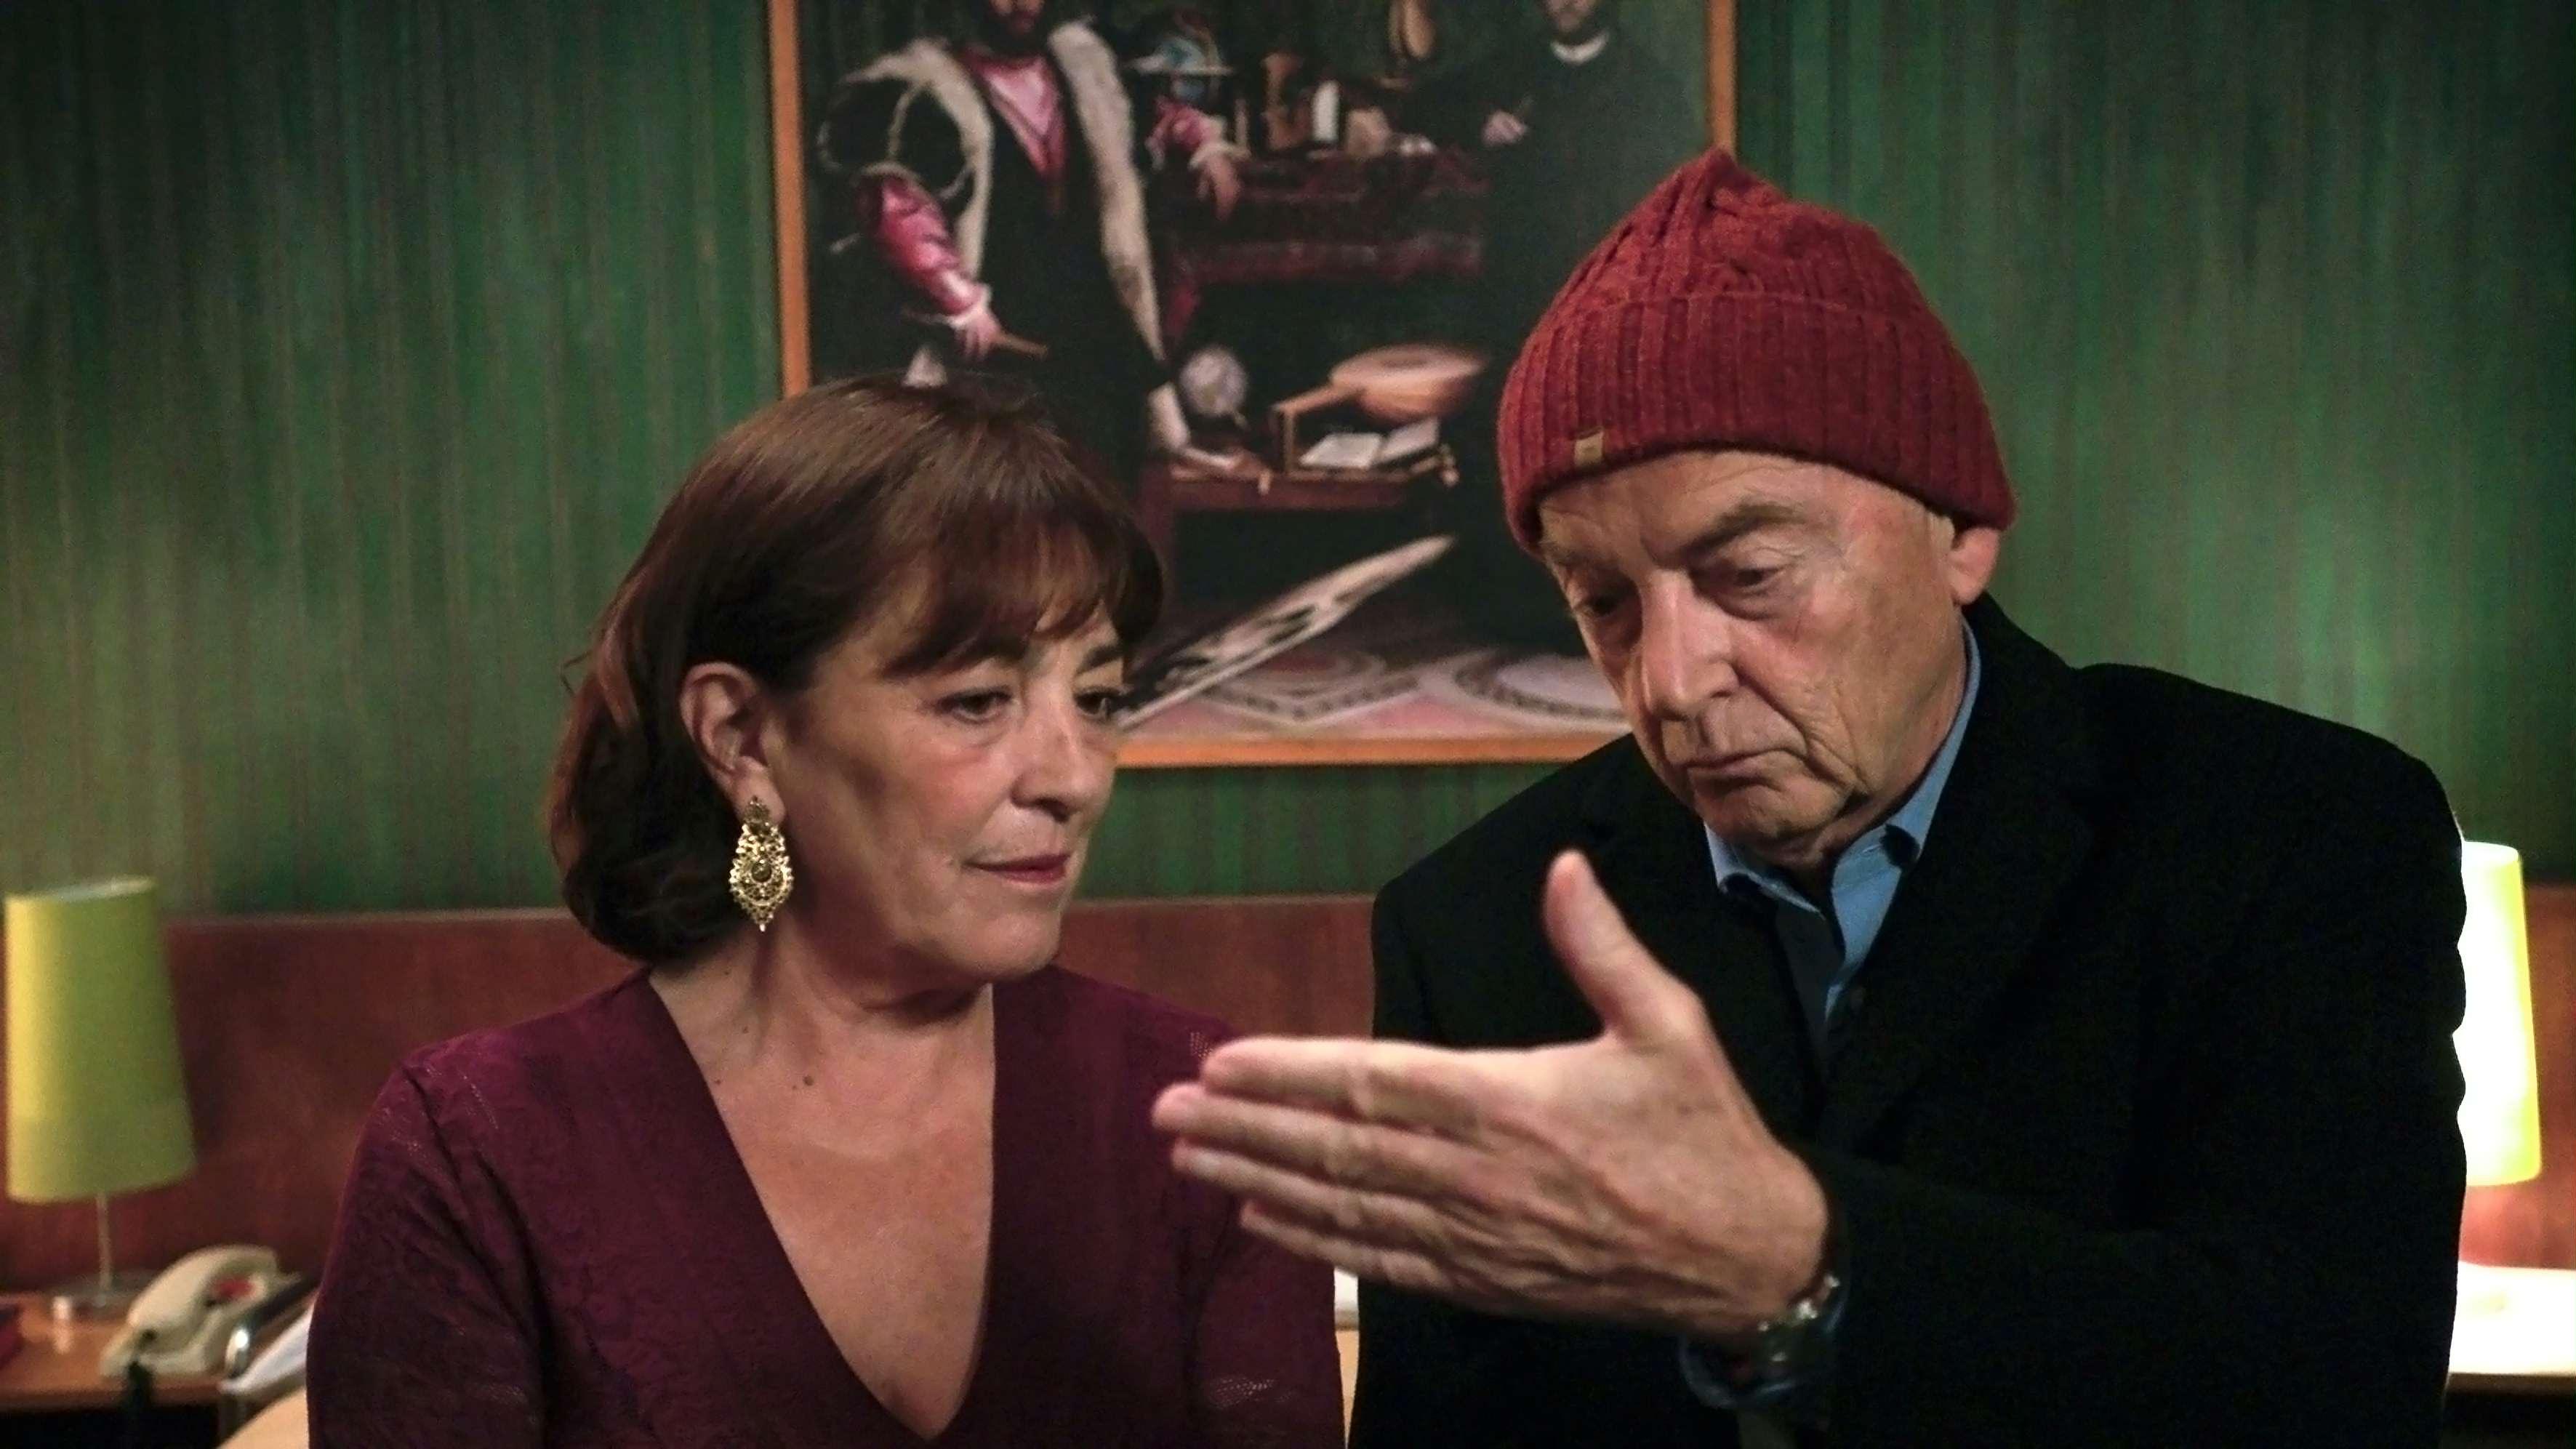 La vanitè: Carmen Maura e Patrick Lapp in una scena